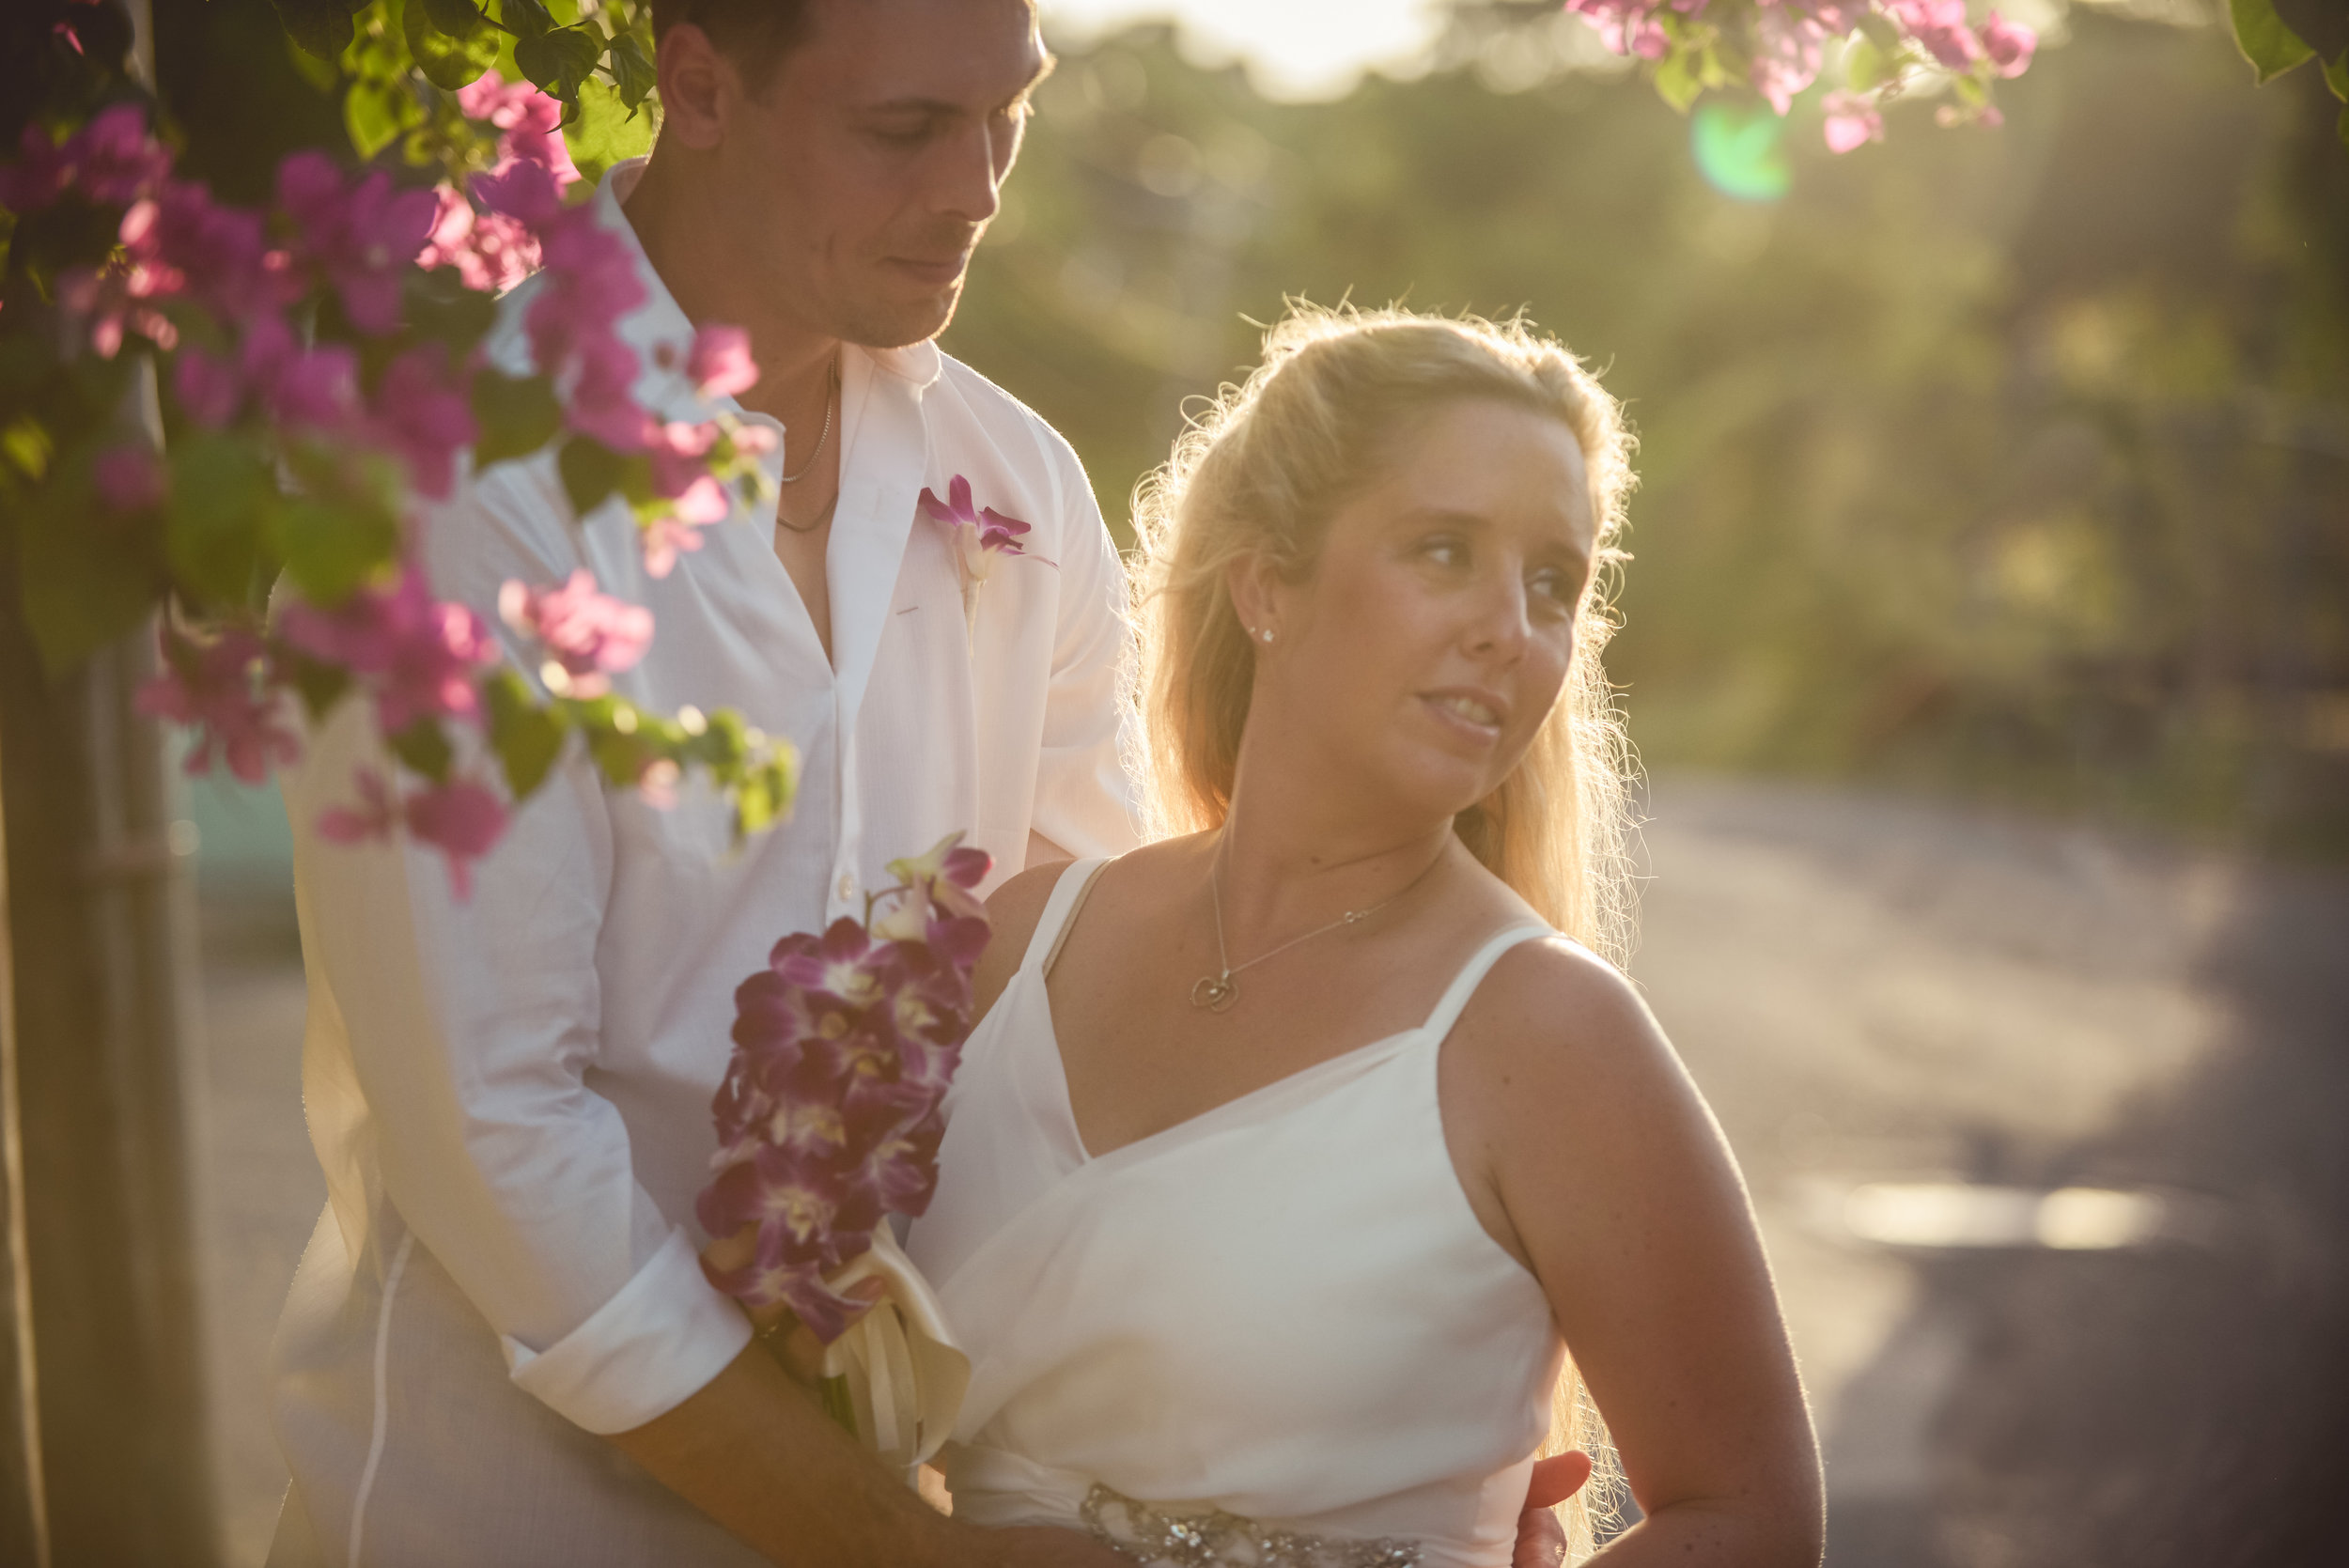 Jamaica Wedding Photography, Meridian Photography, Northern Michigan Wedding Photographers